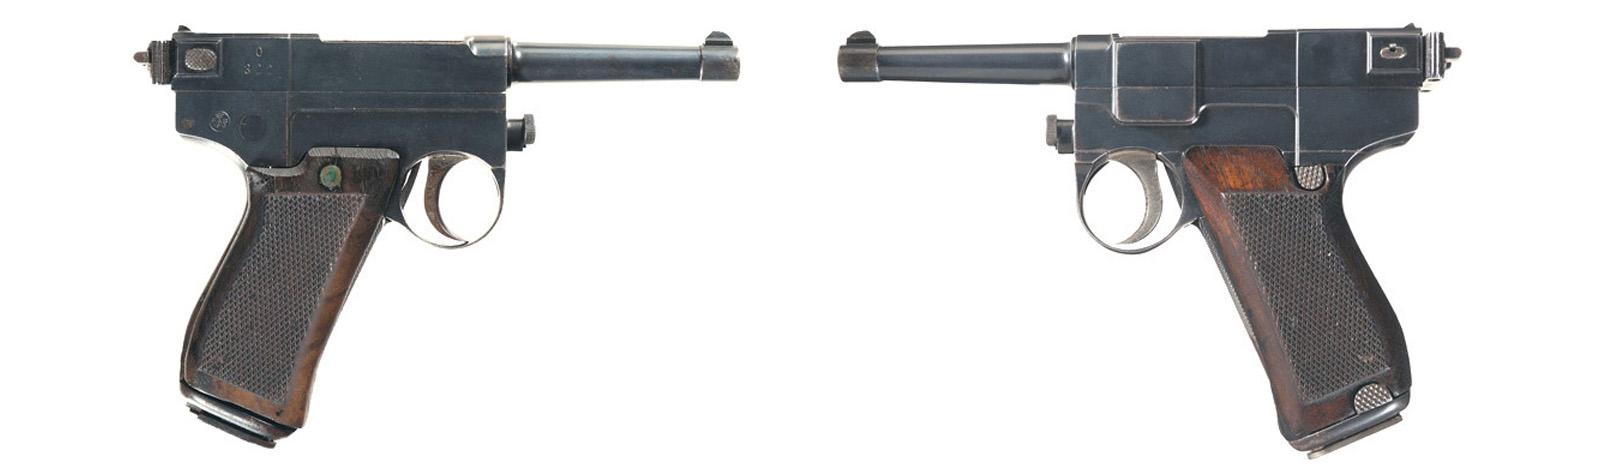 Hibridul italian: pistolul Glisenti model 1910